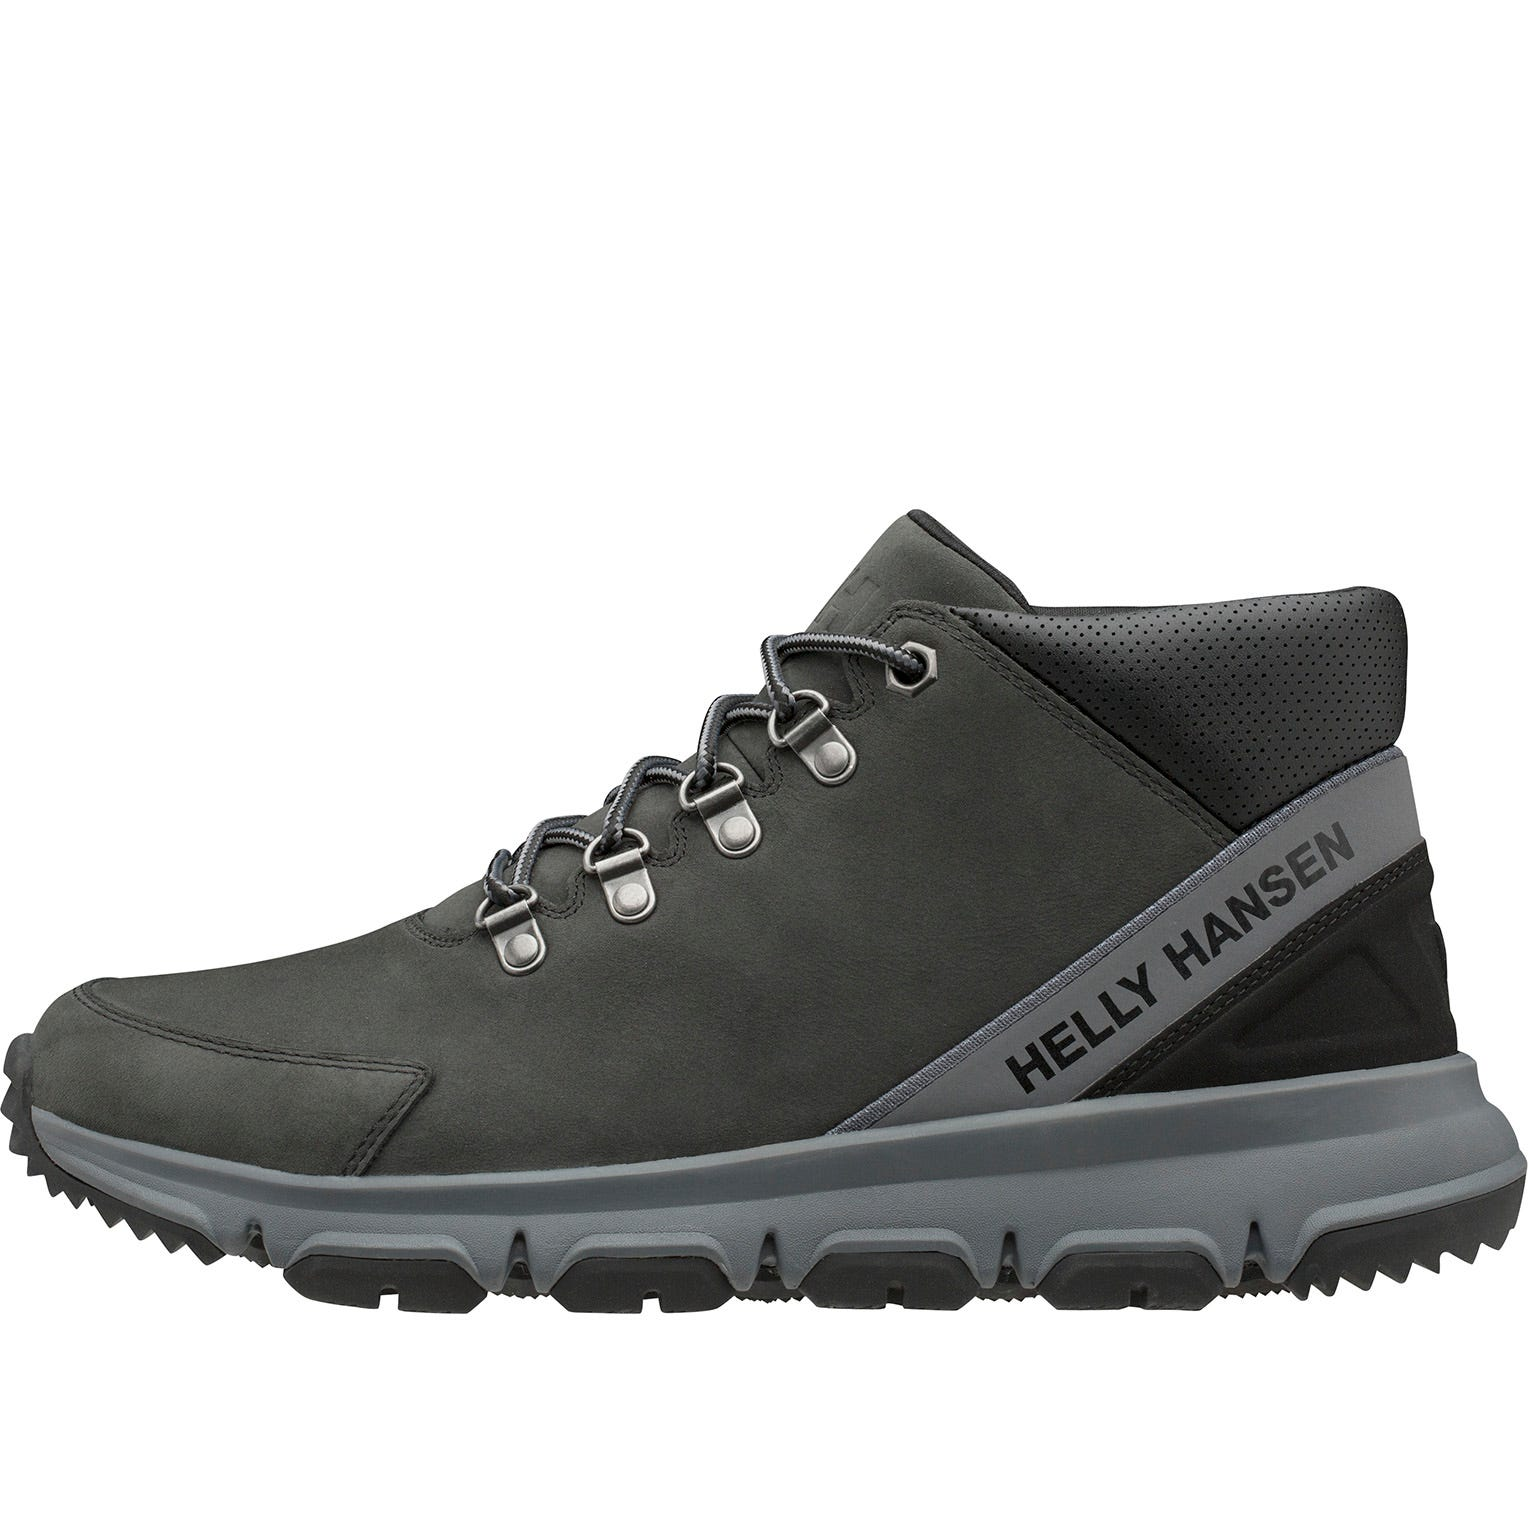 Helly Hansen Mens Fendvard Waterproof Leather Boots Black 11.5